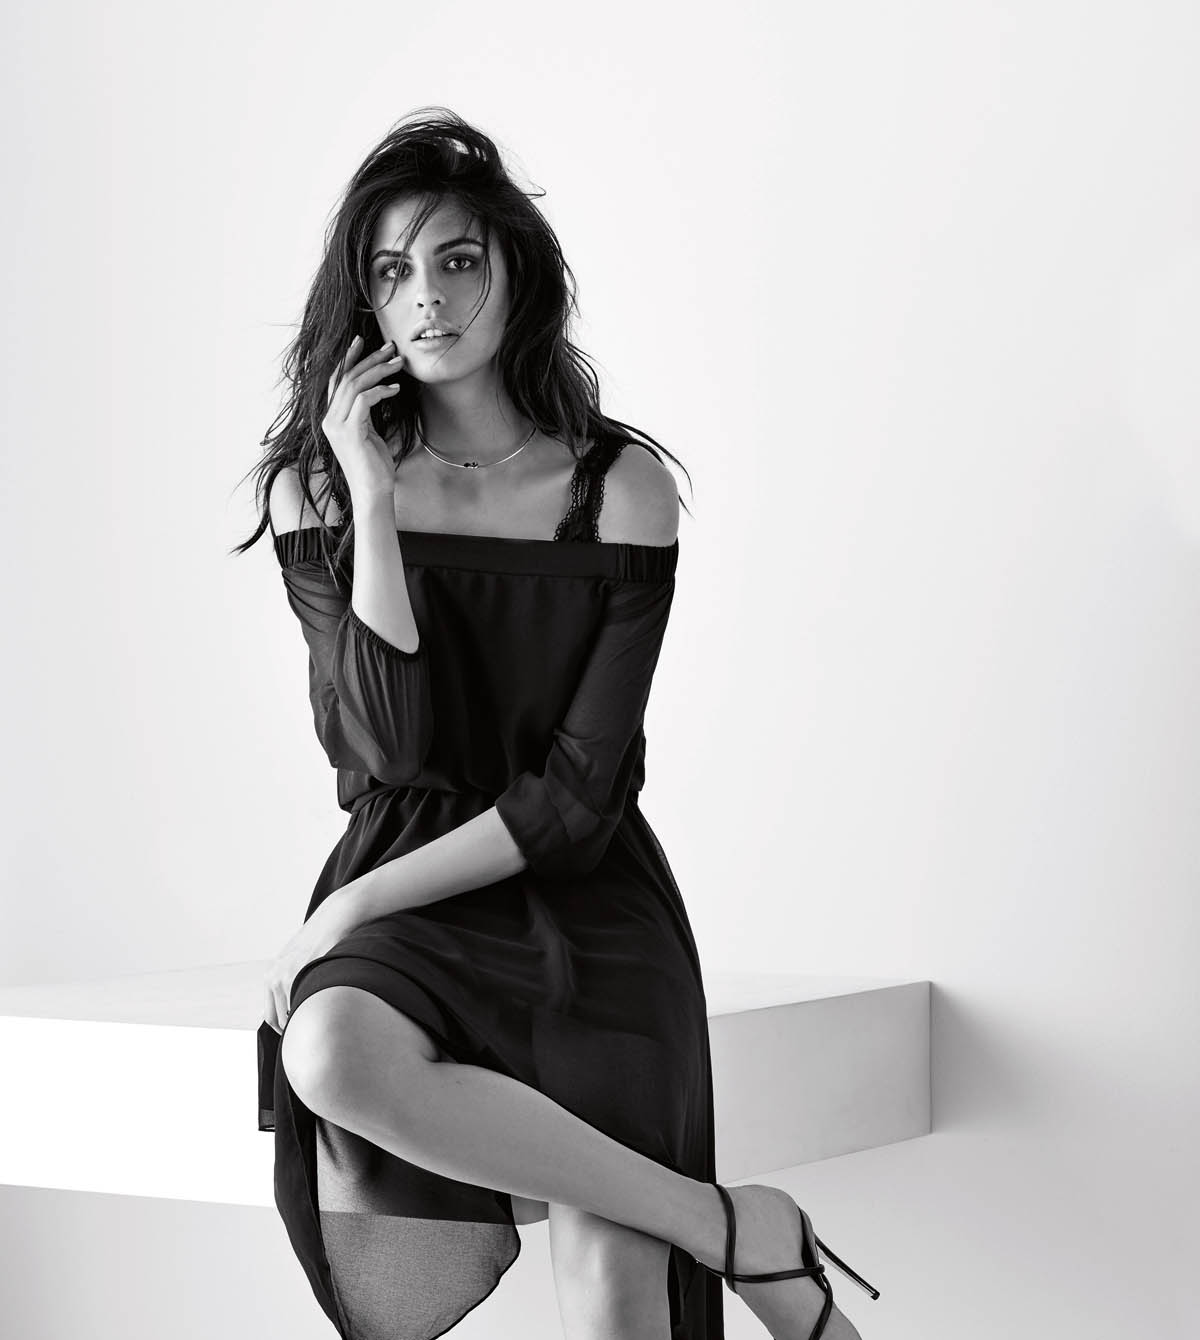 Bojana Krsmanovic Pictures. Hotness Rating = 9.09/10